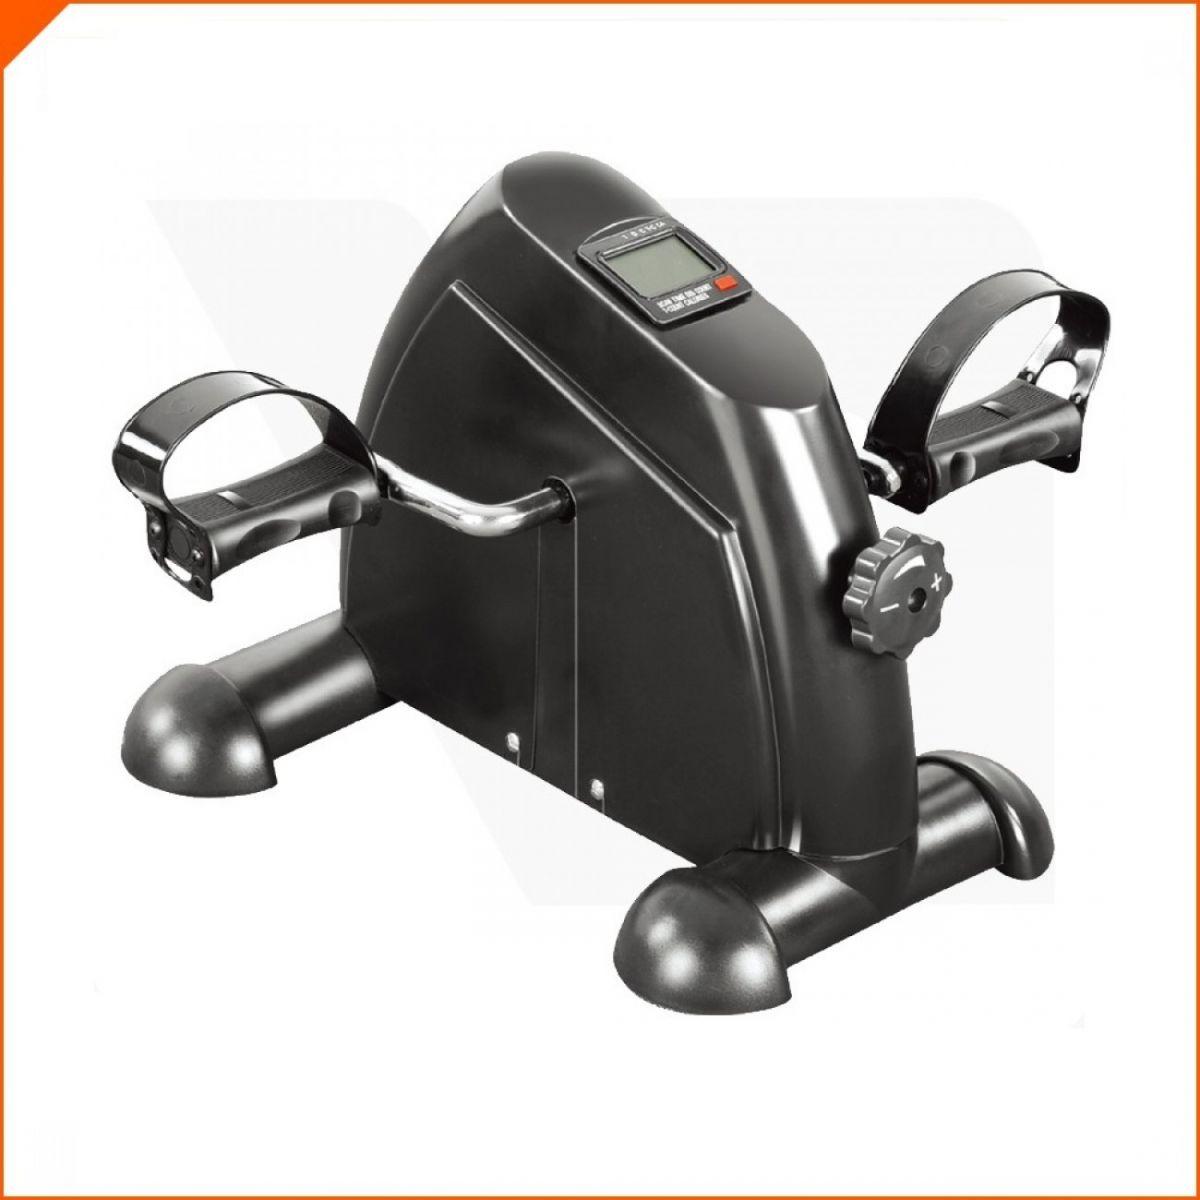 Exercitador Mini Bike com Monitor - LIVEUP - Loja Portal